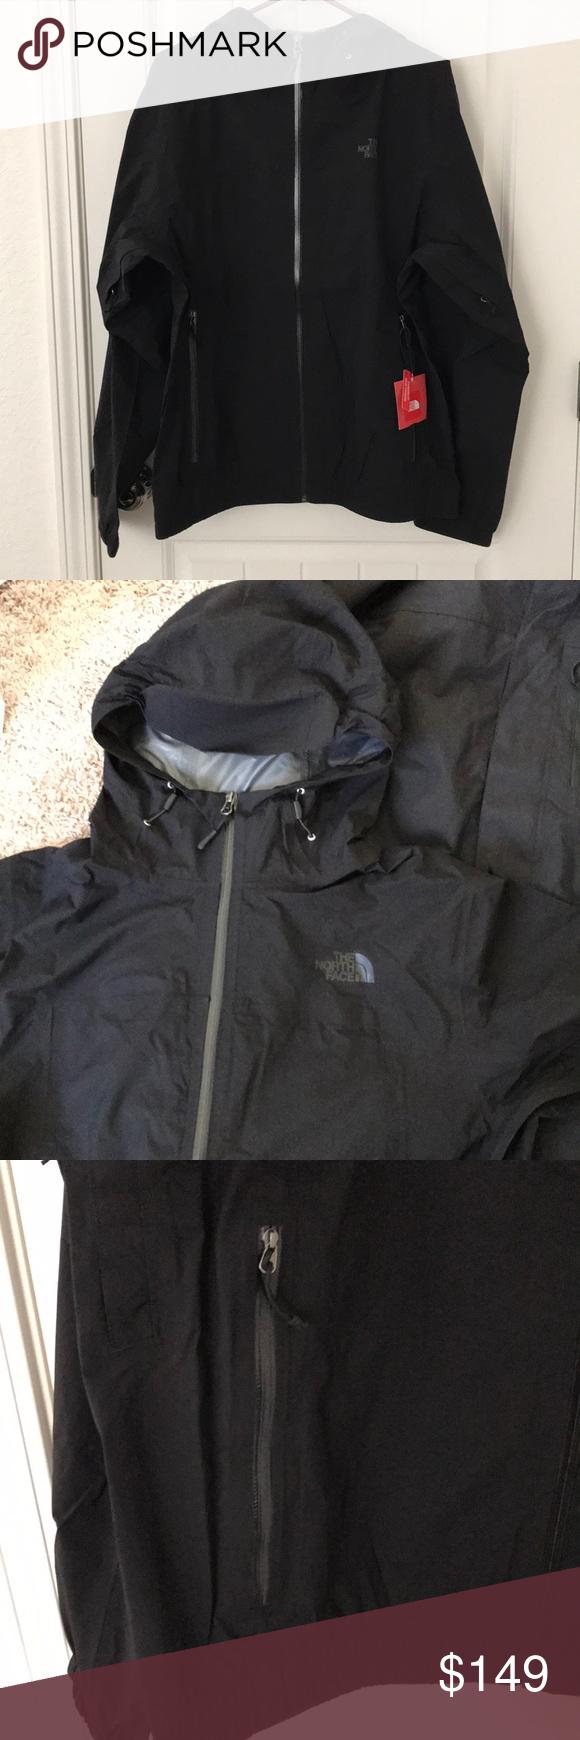 The North Face Hlandtechshell Rto Jacket Jacket Brands Jackets North Face Jacket [ 1740 x 580 Pixel ]